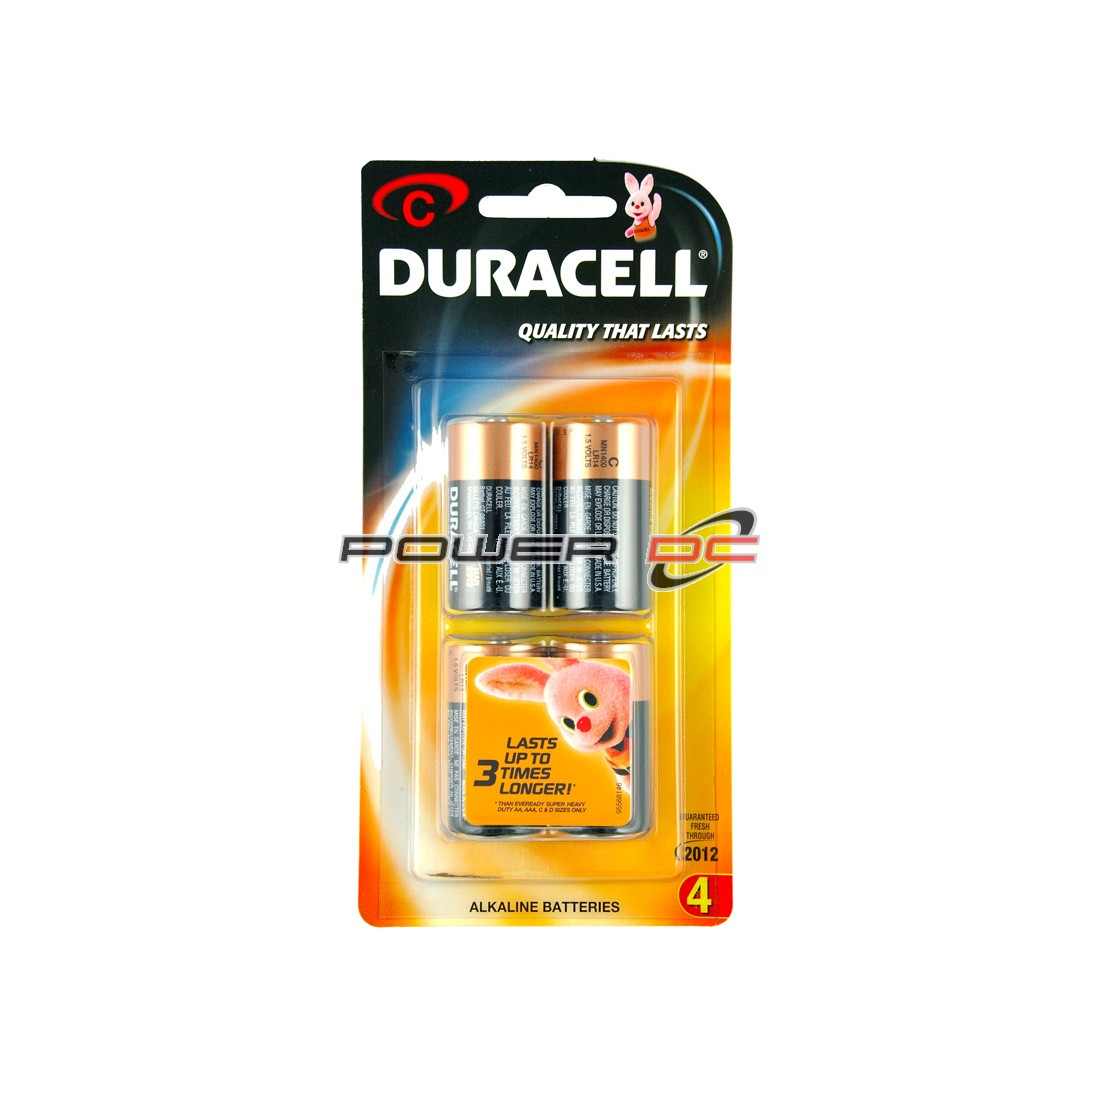 DURACELL C BP4